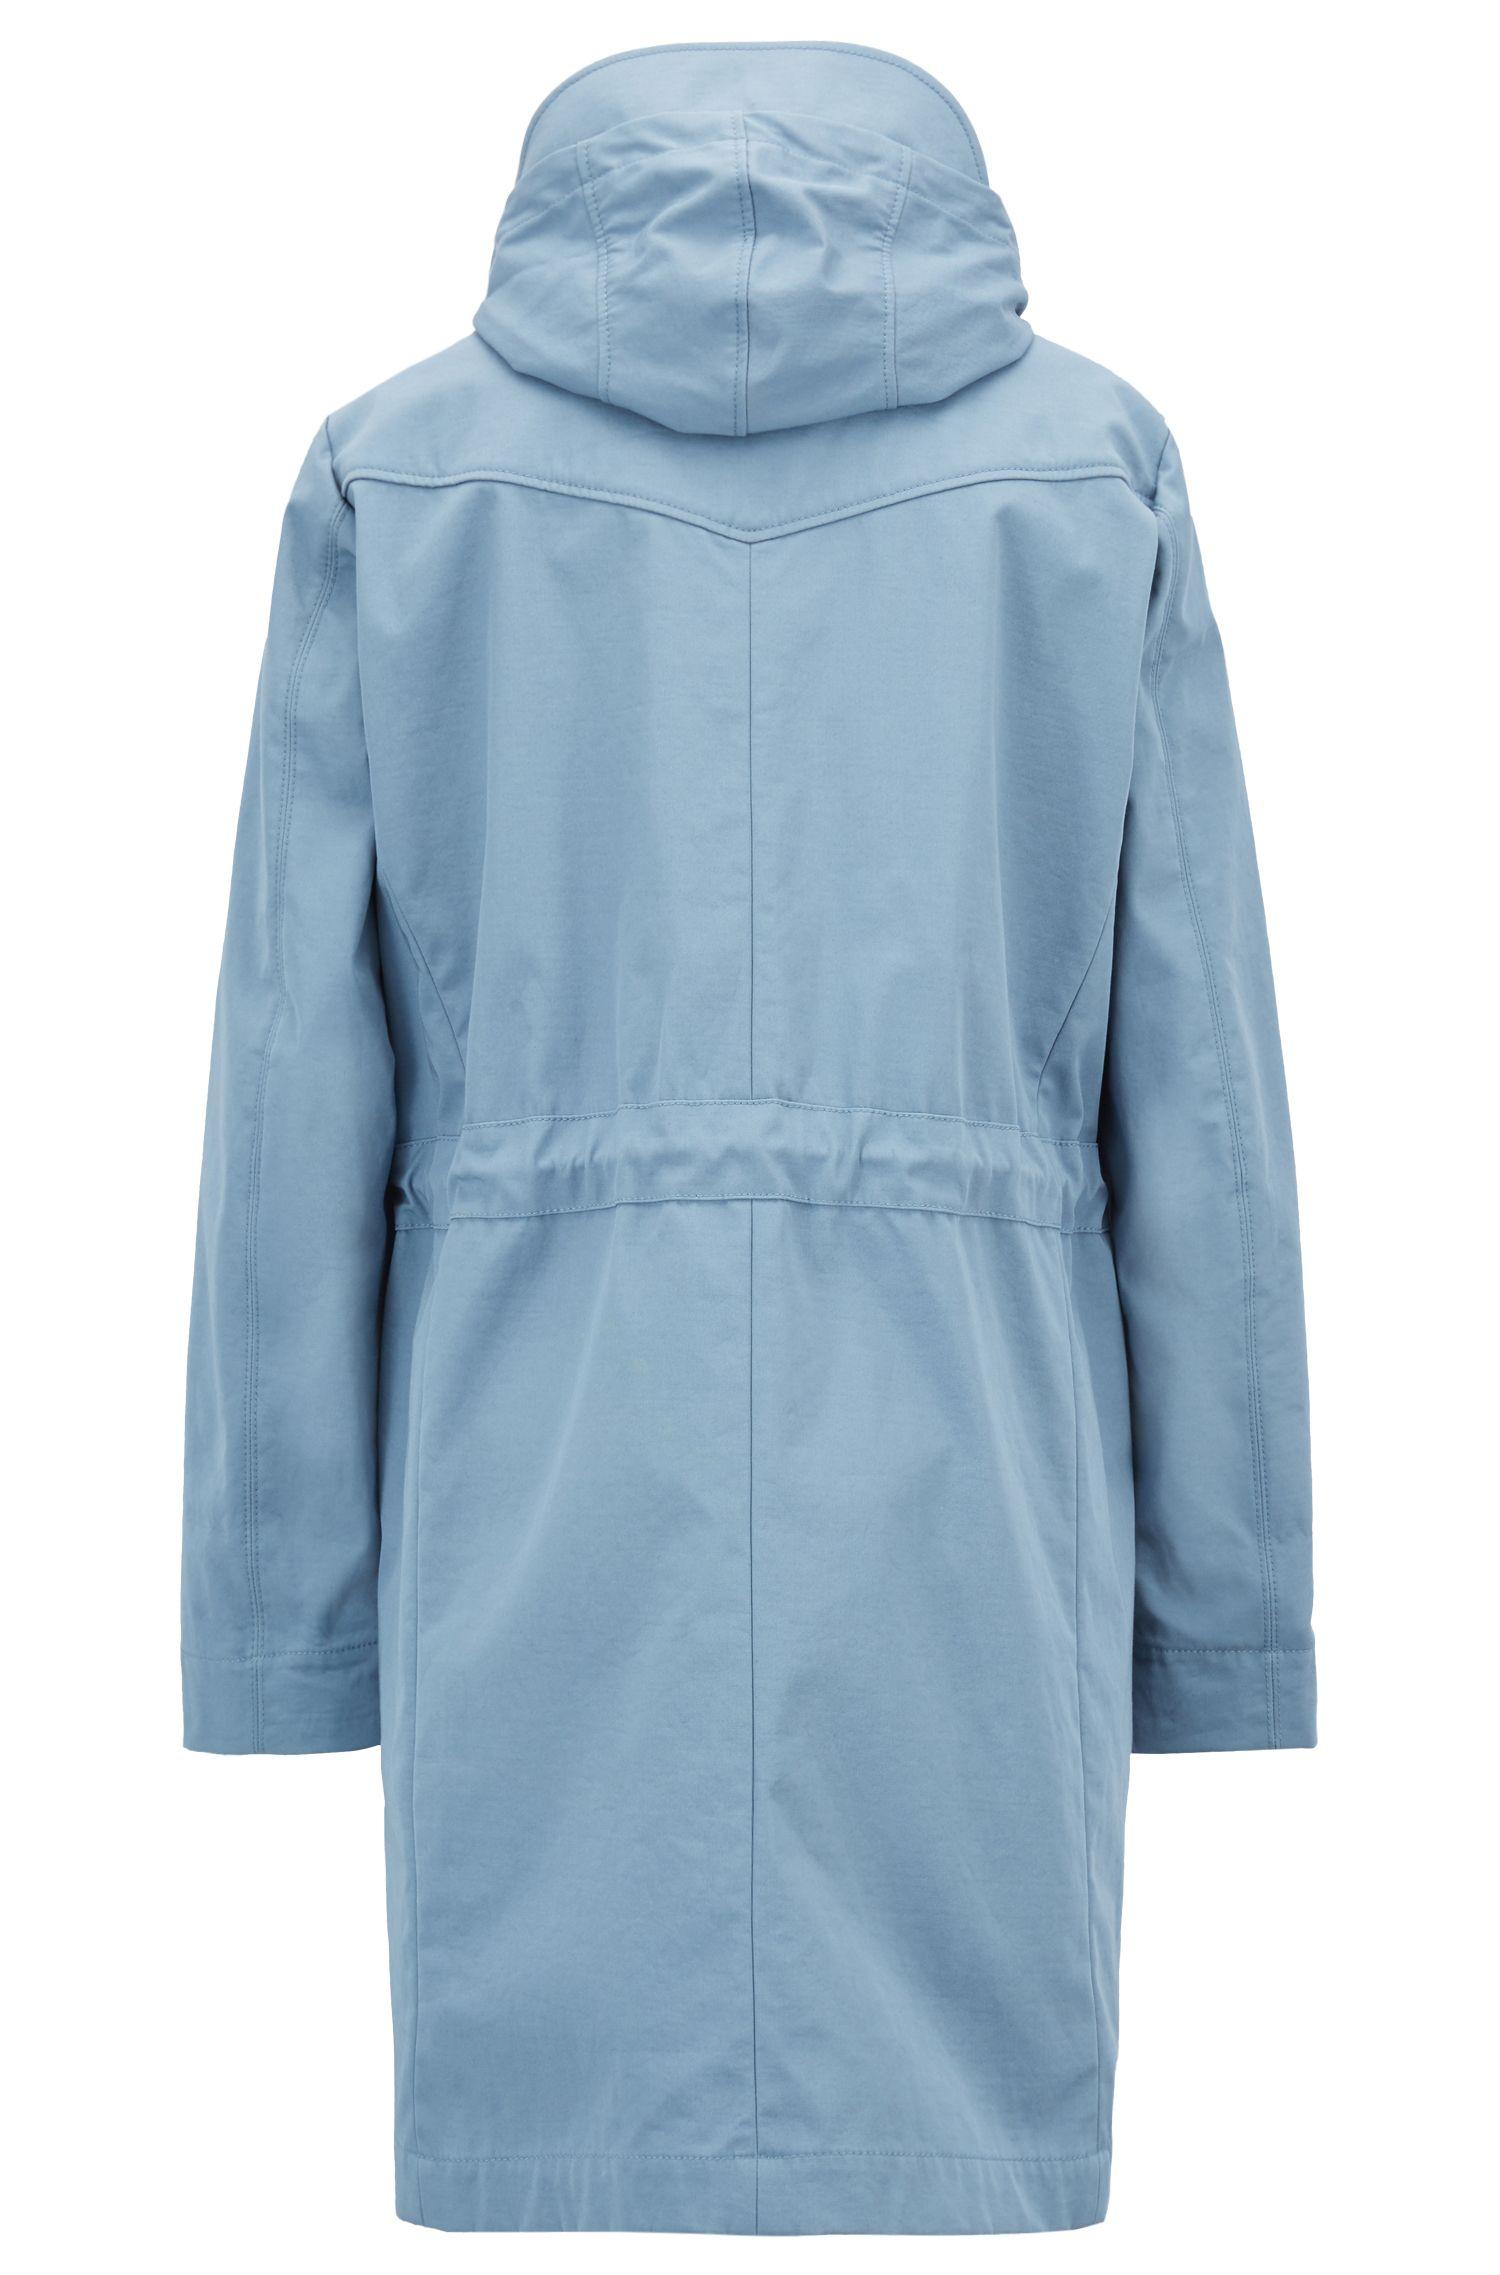 Parka con capucha en tejido de mezcla de algodón repelente al agua